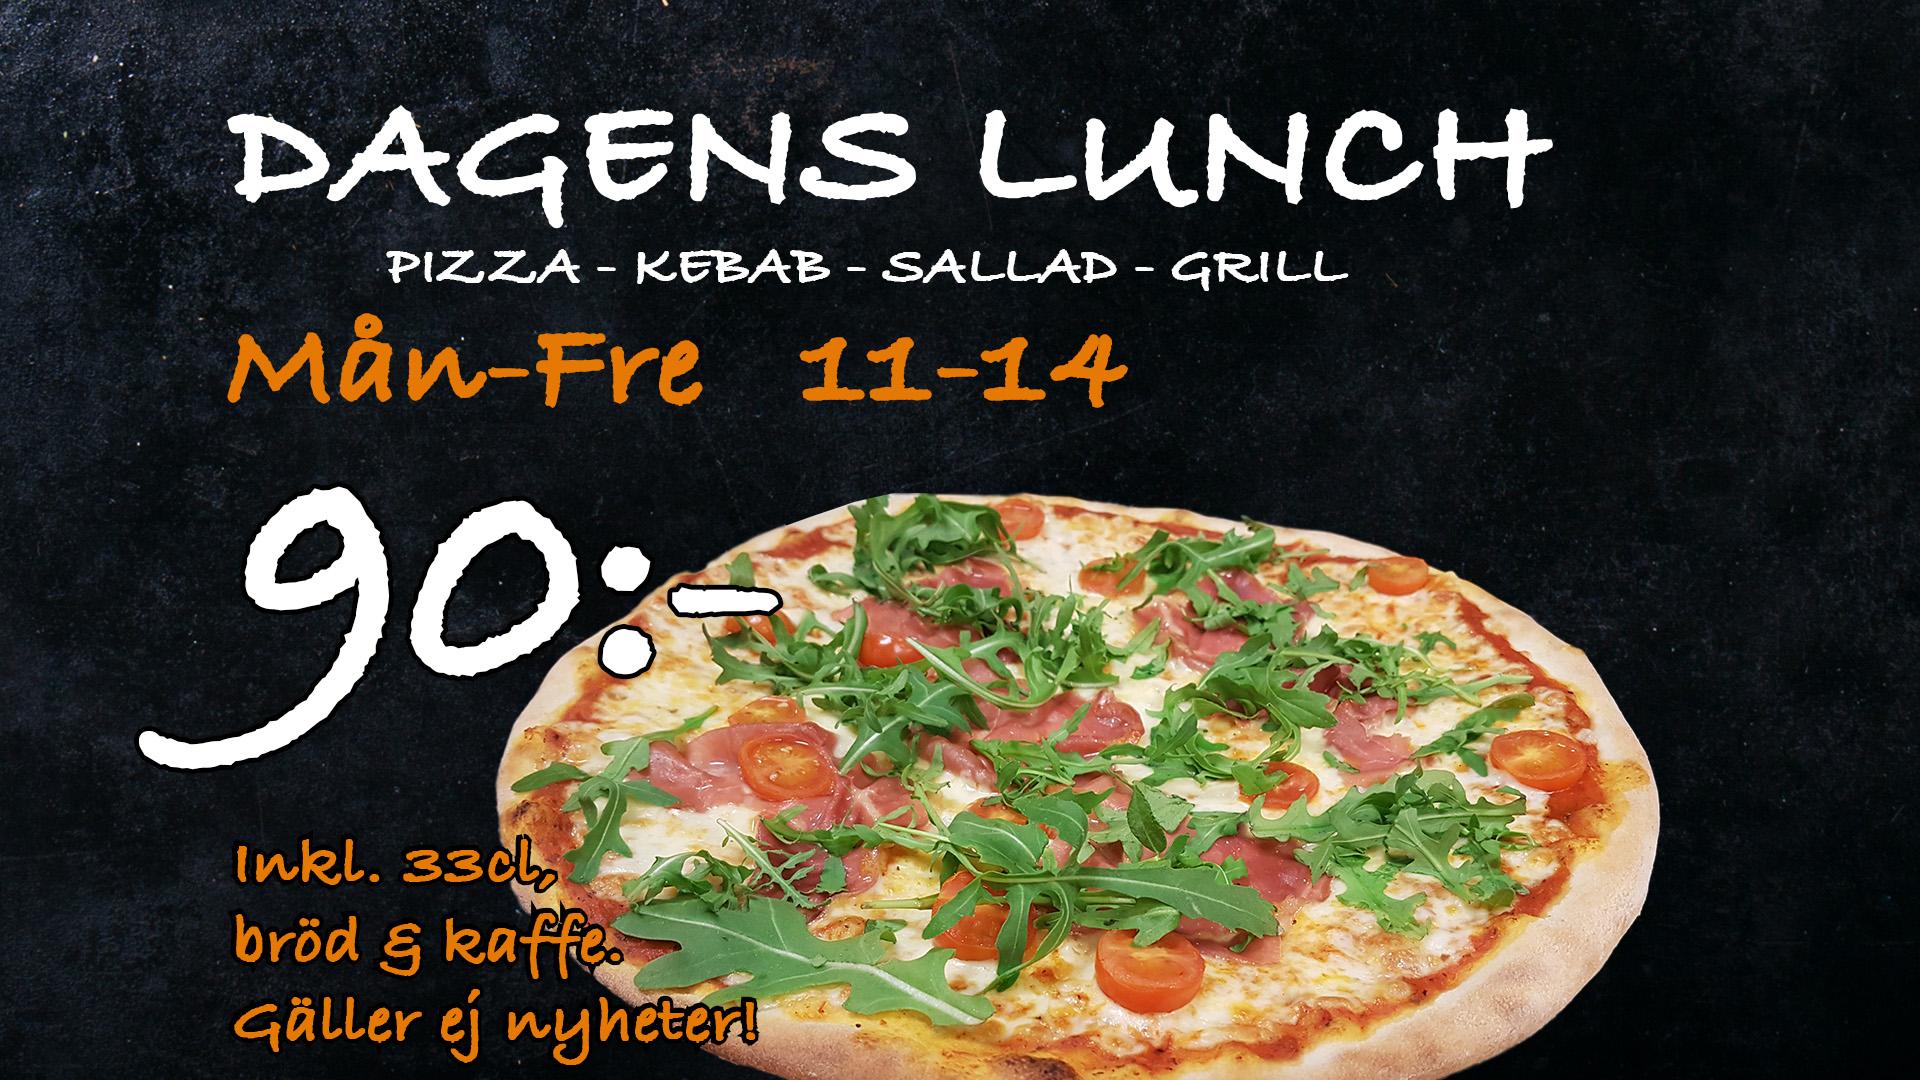 Dagens-lunch-hemsida